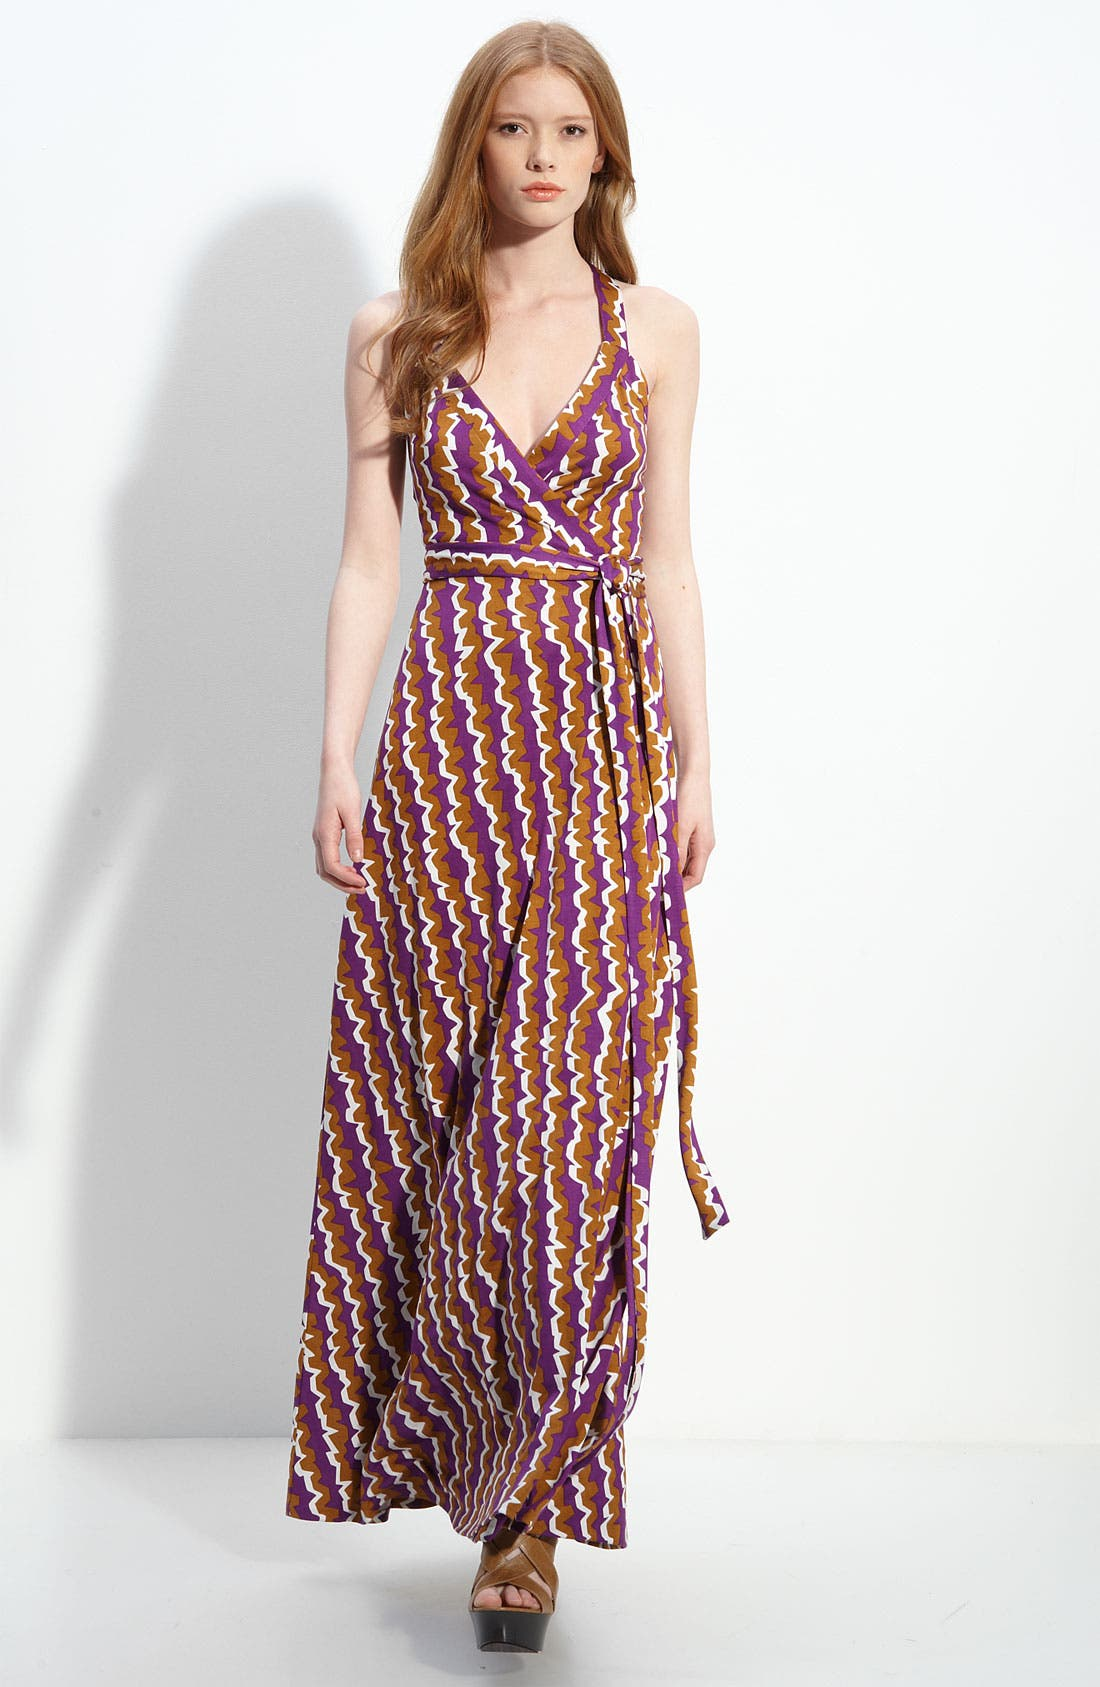 Alternate Image 1 Selected - Diane von Furstenberg 'Samson' Silk Jersey Wrap Dress